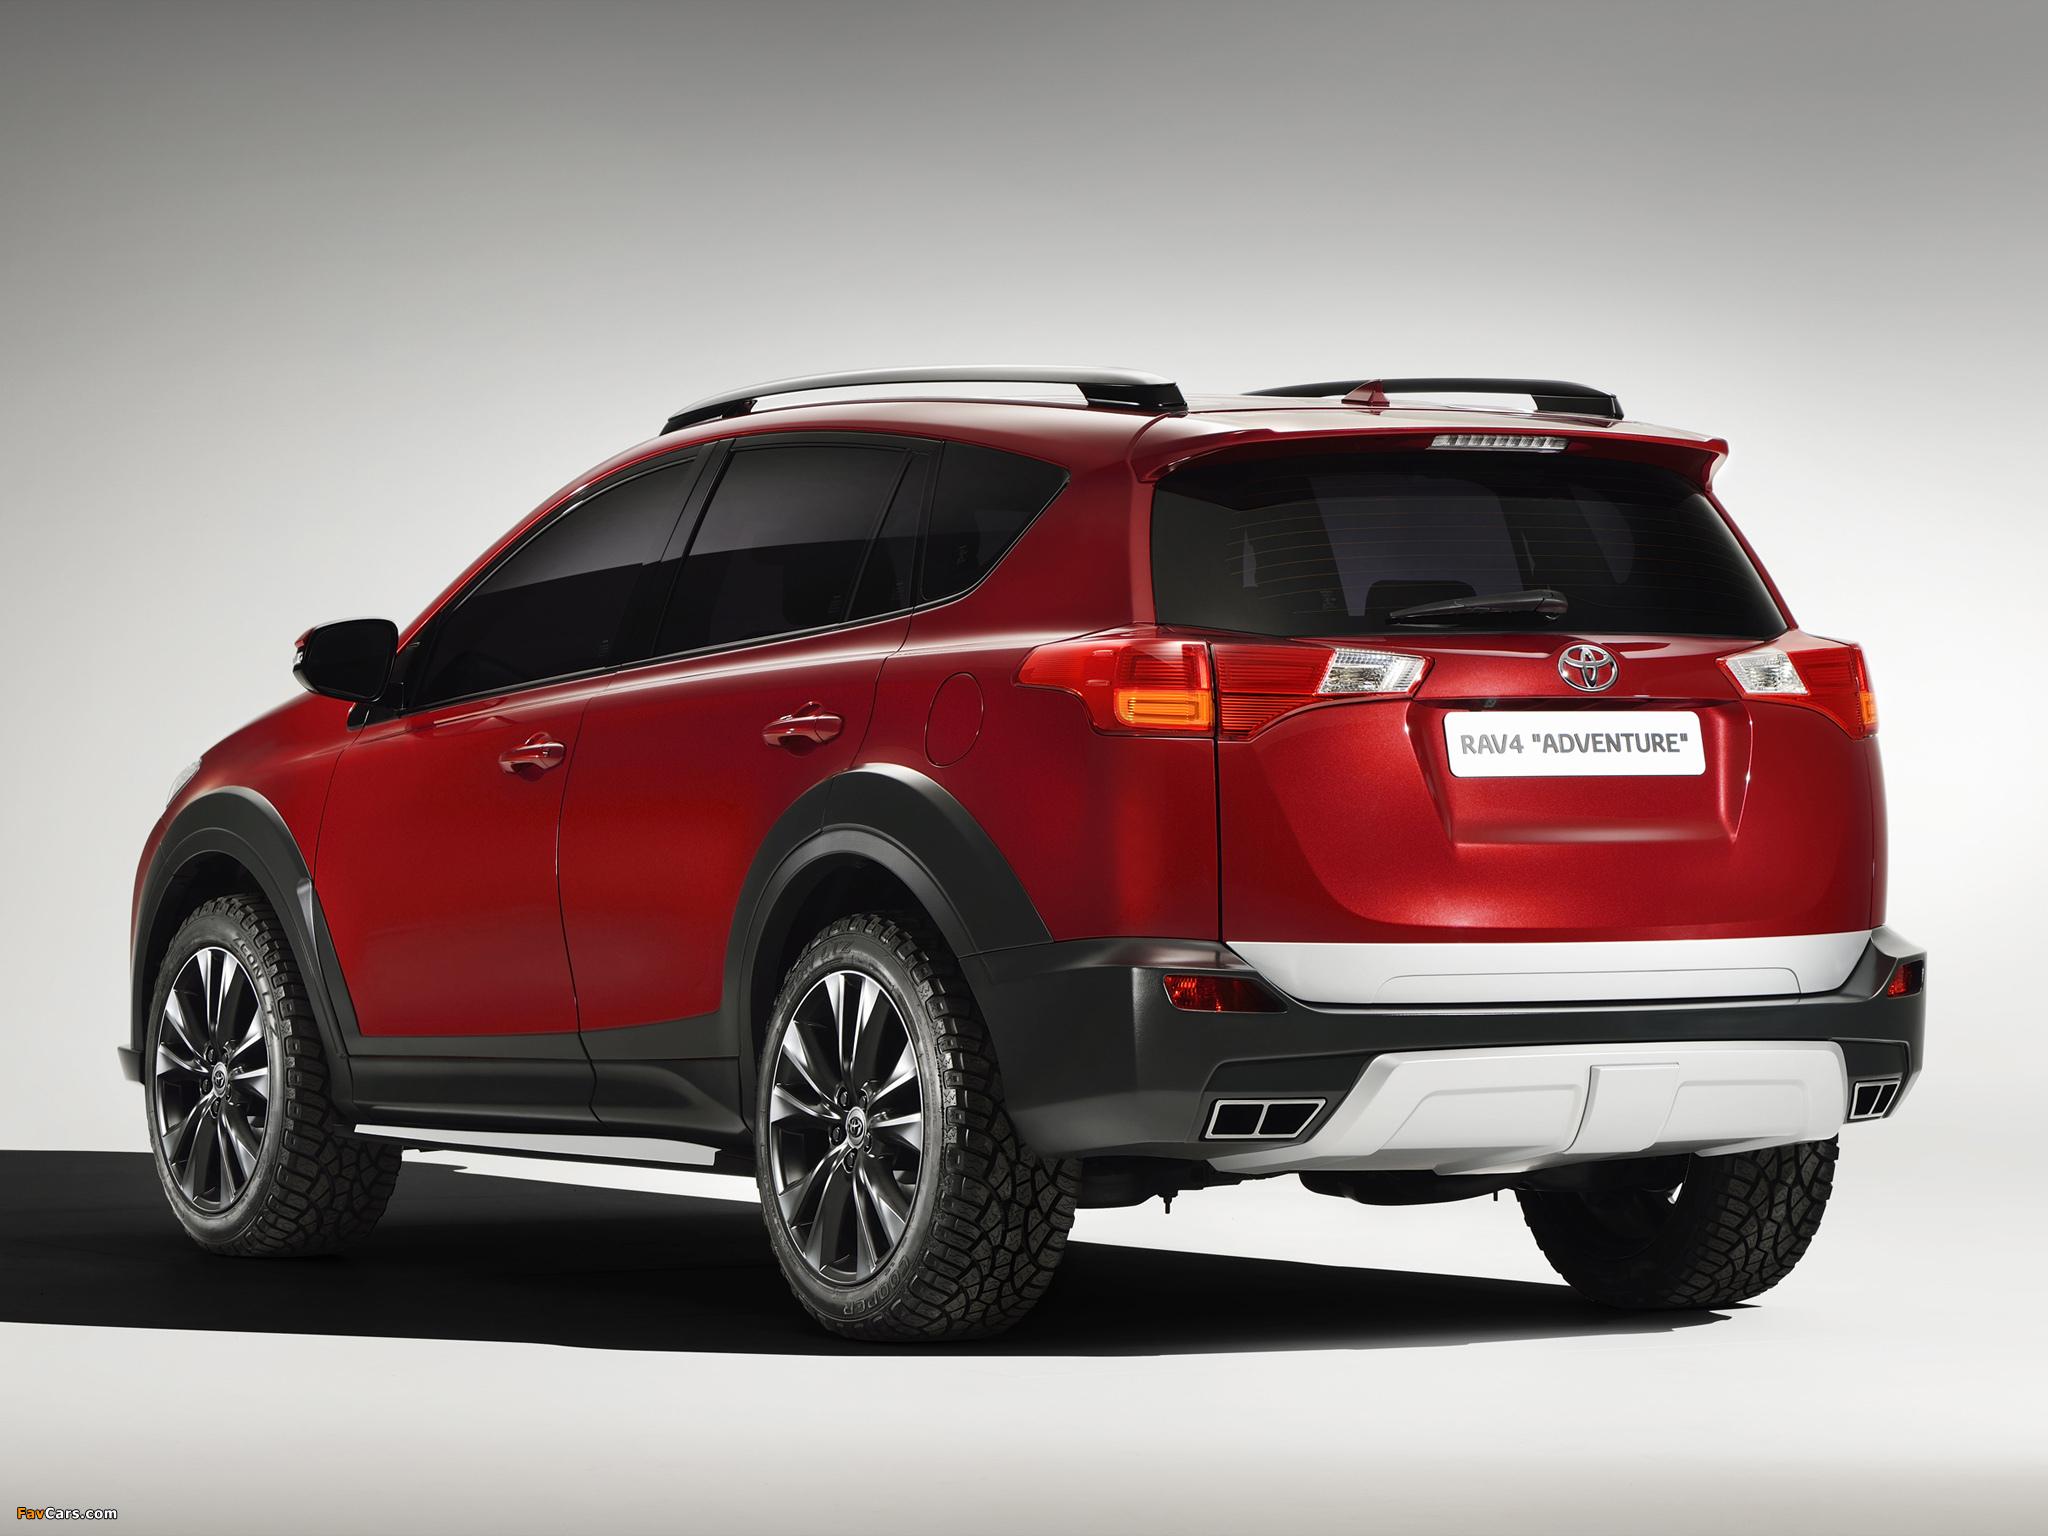 Toyota RAV4 Adventure Concept 2013 photos (2048 x 1536)